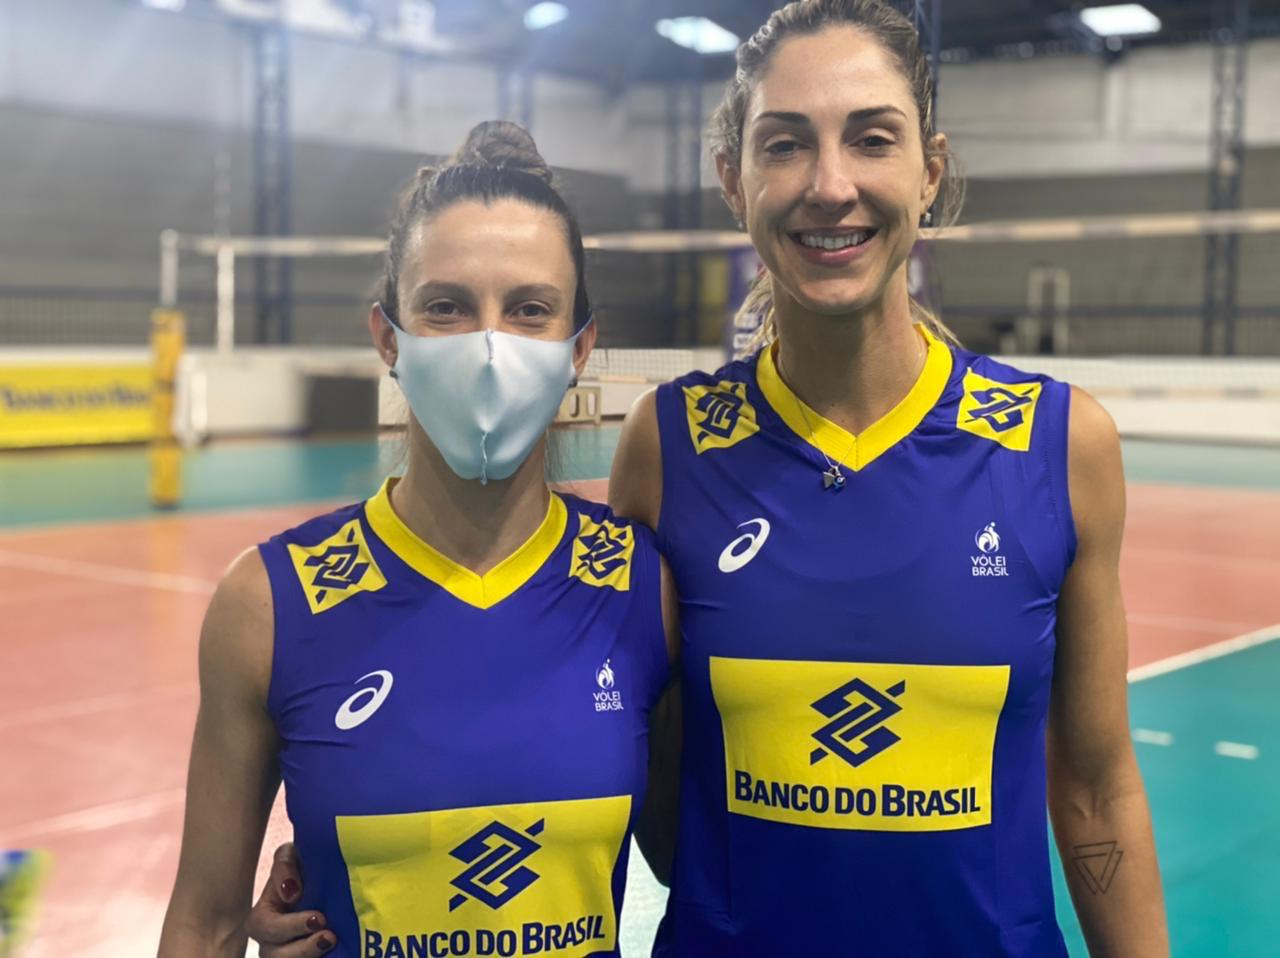 Macrís e Carol Gattaz vão representar o Brasil na Itália (Foto: Divulgação/MTC)